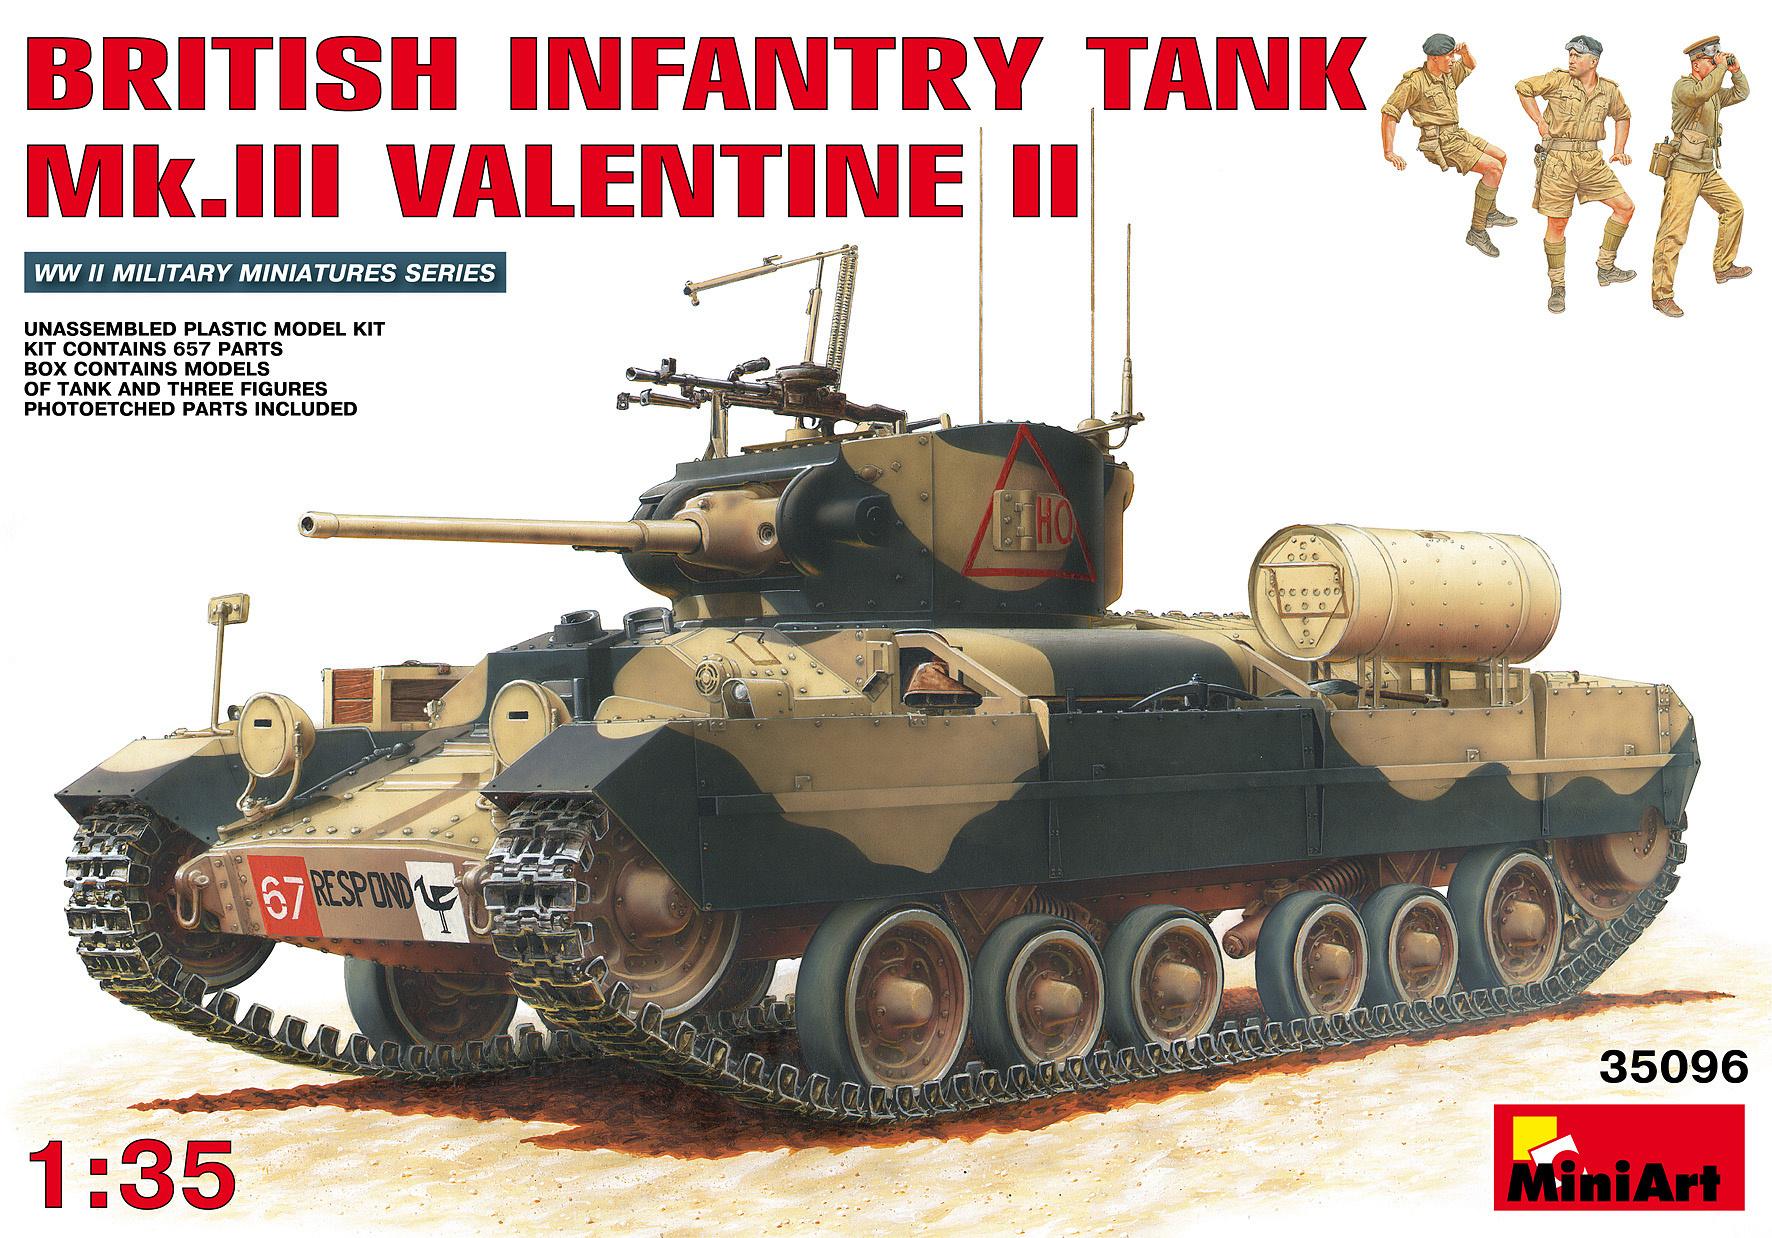 MiniArt British Infantry Tank Mk.III Valentine II - Scale 1/35 - Miniart - MIT35096